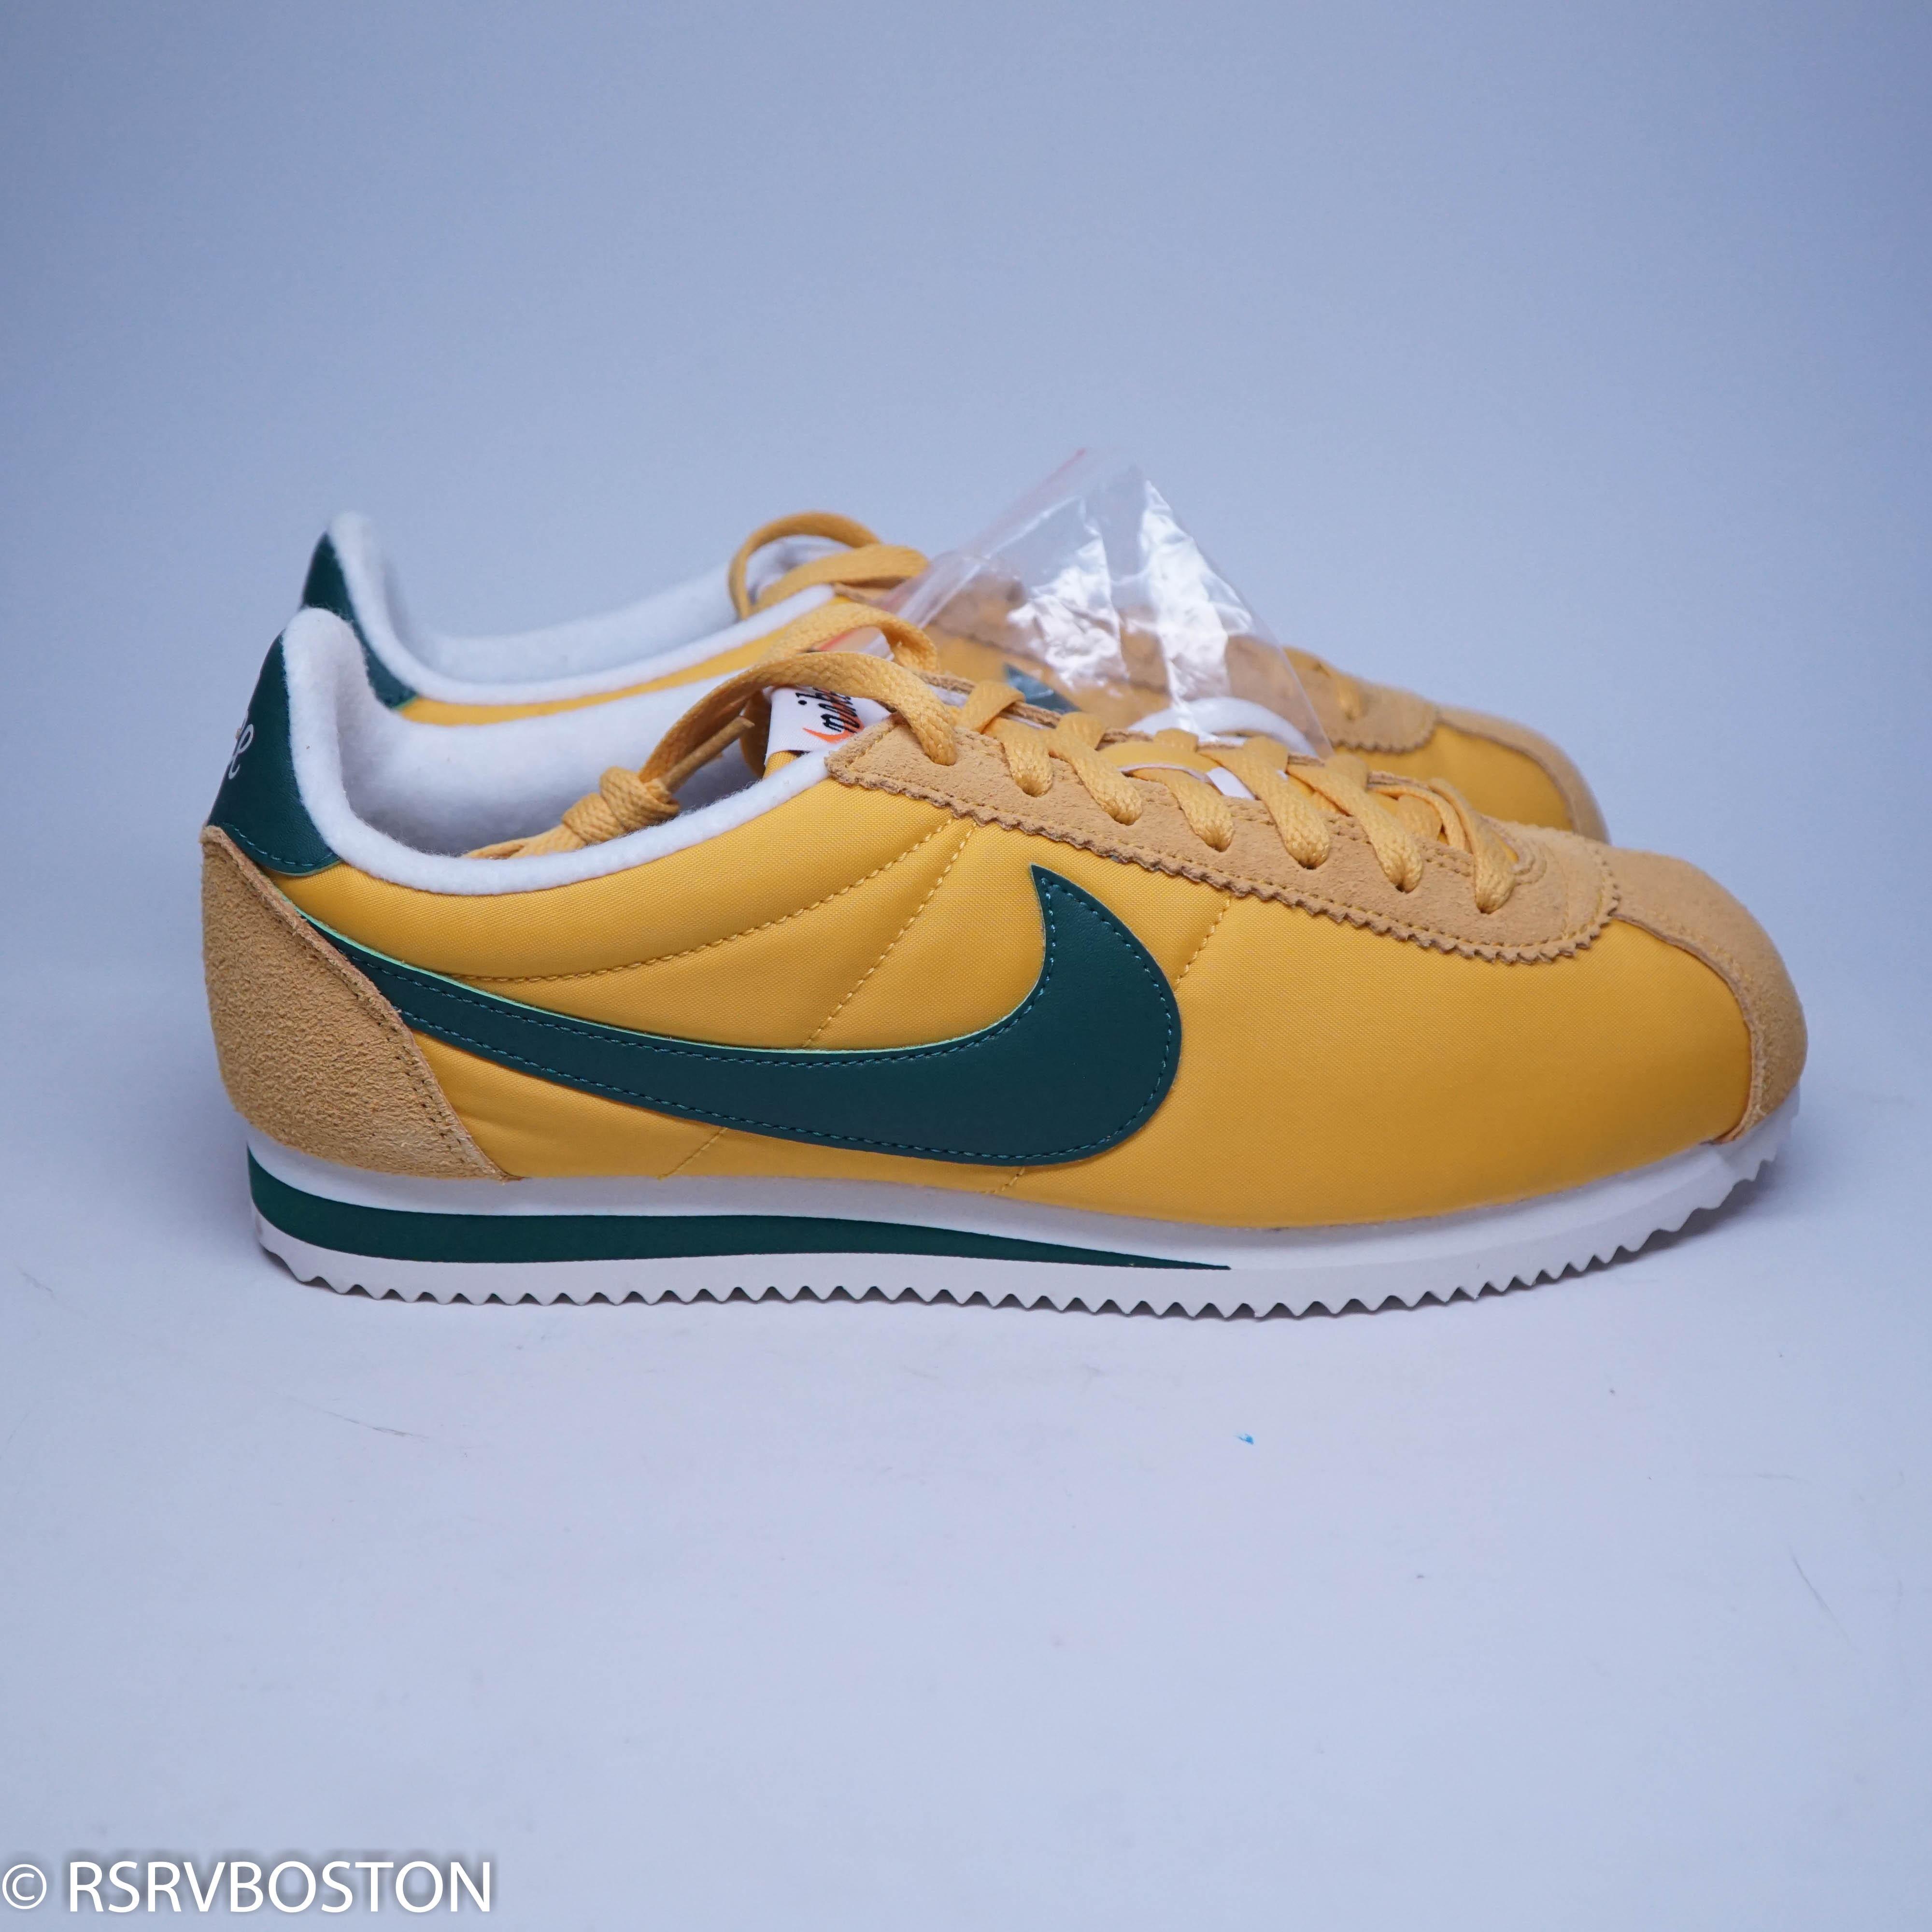 cheaper 6f6db ee07d Nike. Classic Cortez Nylon Premium XLV Oregon Yellow Ochre  Gorge Green-  Sail